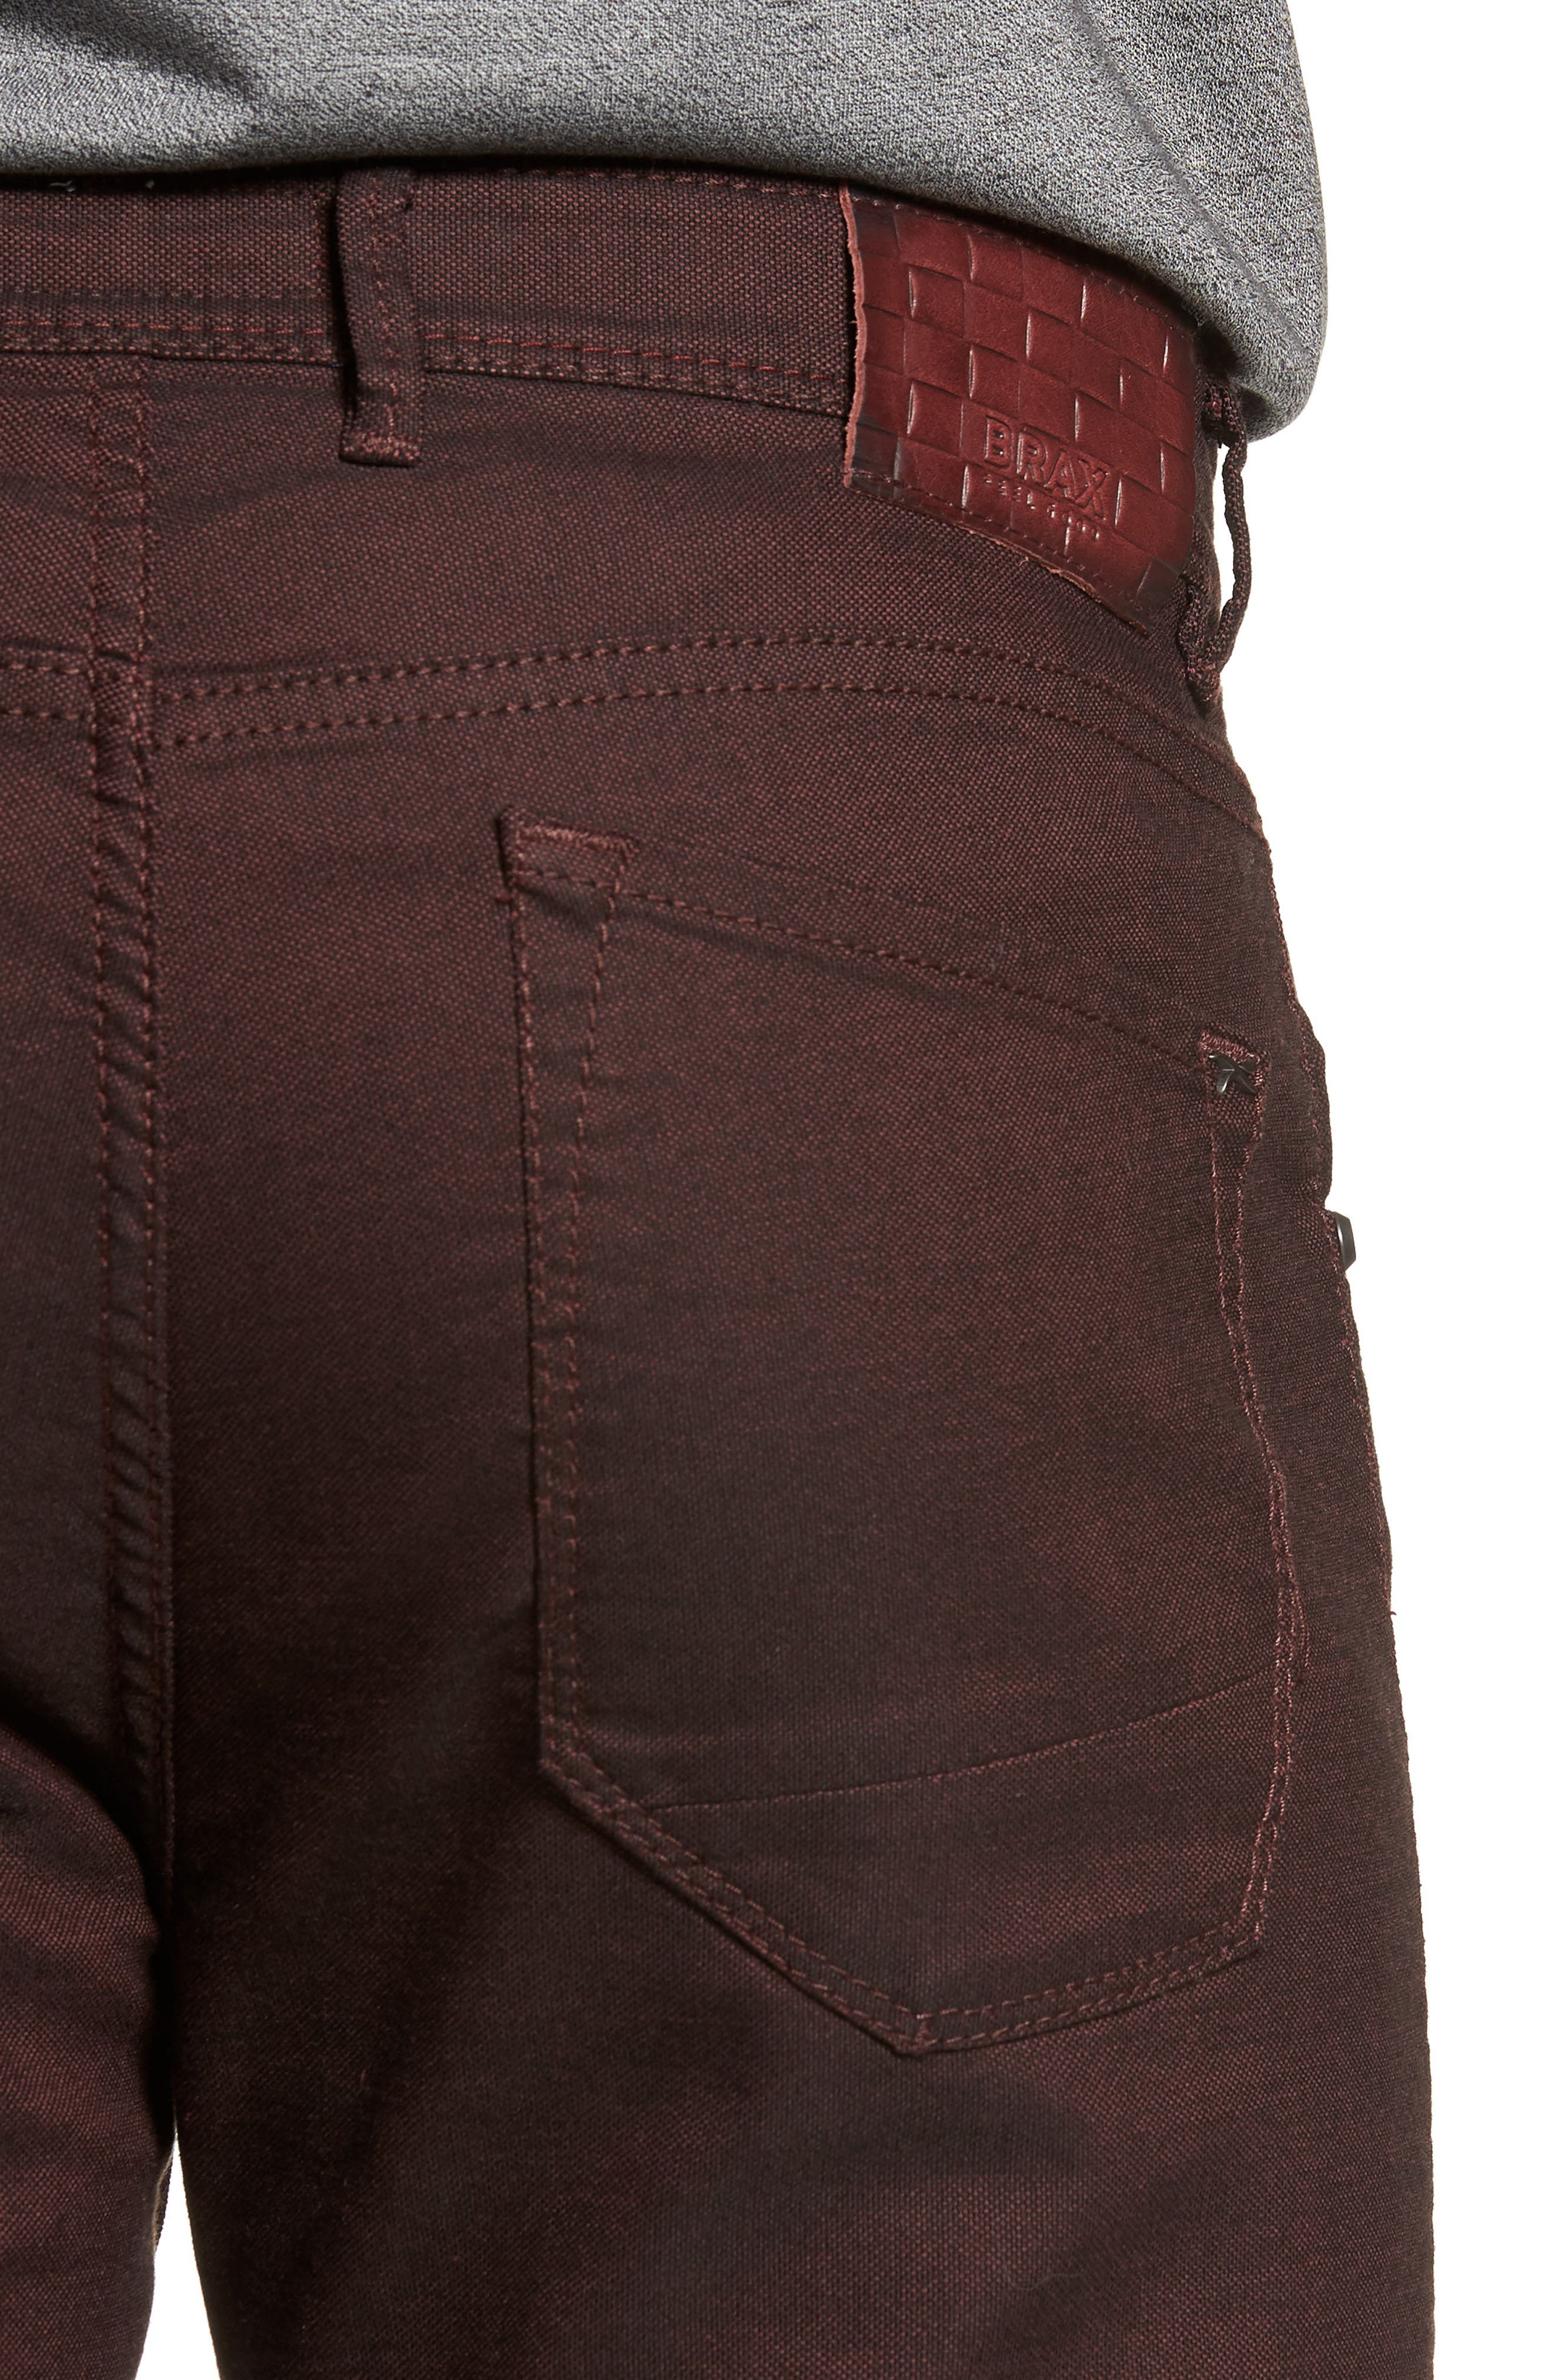 BRAX,                             Slim Fit Five-Pocket Pants,                             Alternate thumbnail 4, color,                             602